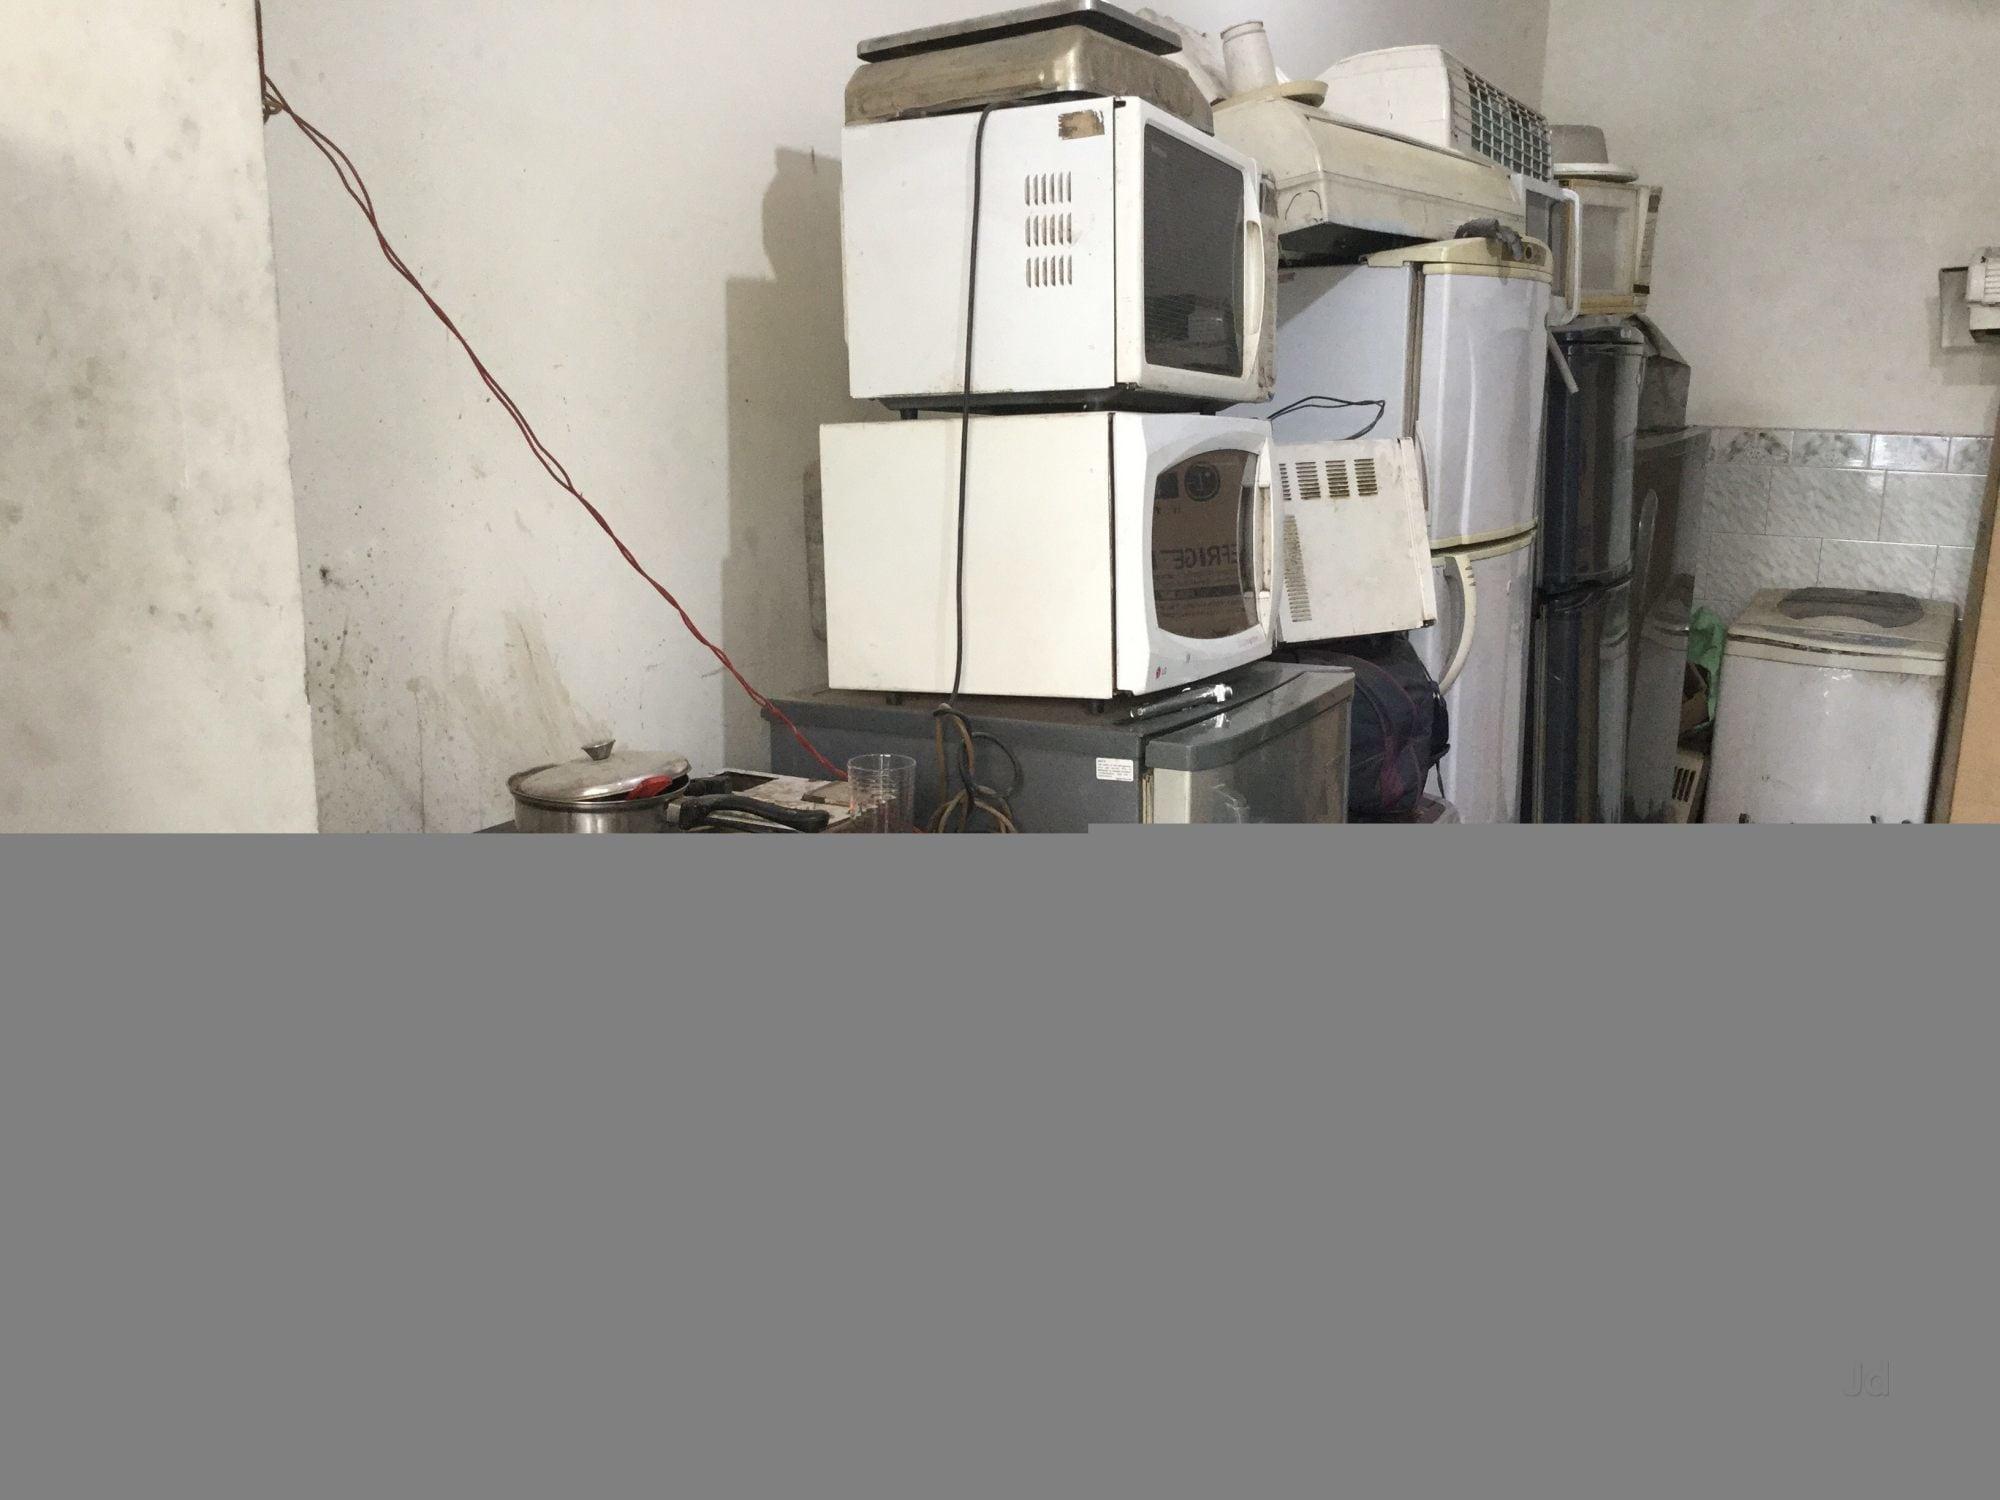 Top 100 Refrigerator Compressor Repair Services In Yamunanagar Refrigeration Wiring